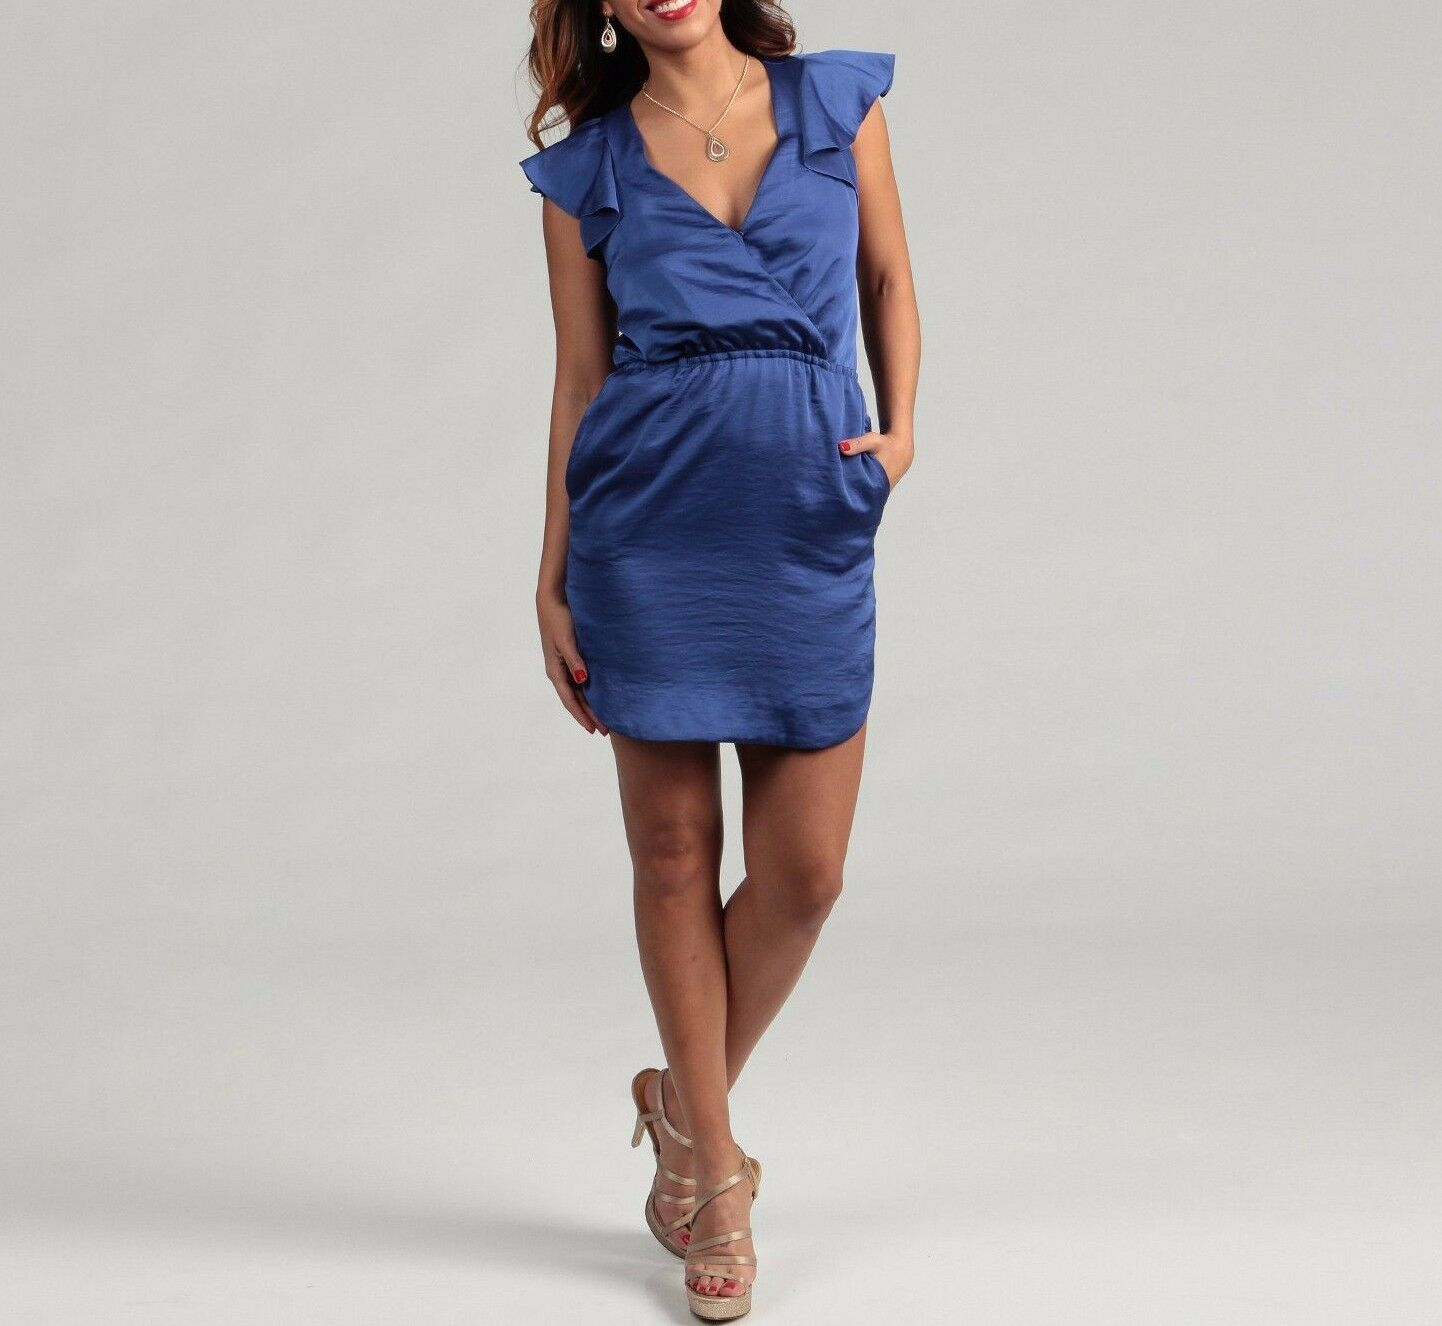 BCBG Generation Women's Size Large bluee Azure Ruffle Strap Dress